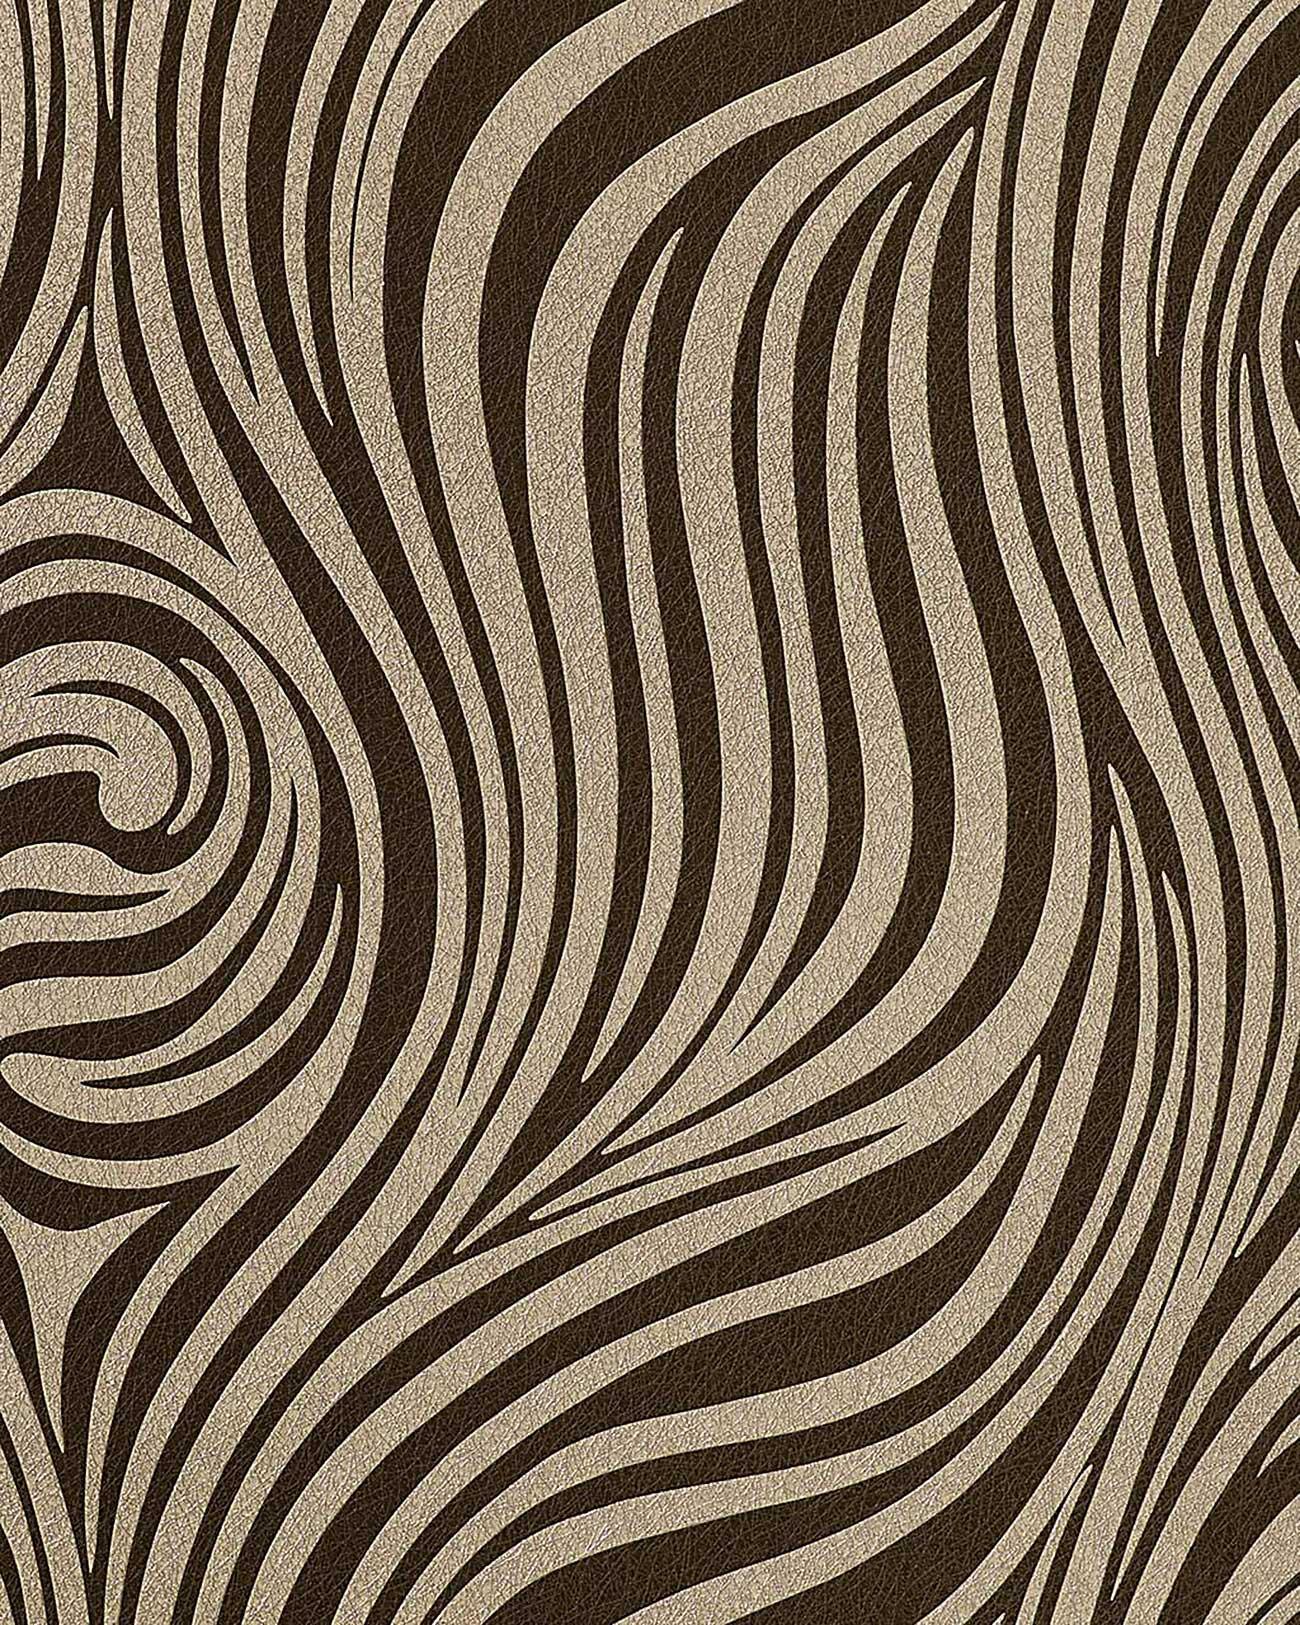 original edem kakao braun braun zebra streifen gestreiftes struktur muster wallpapers. Black Bedroom Furniture Sets. Home Design Ideas